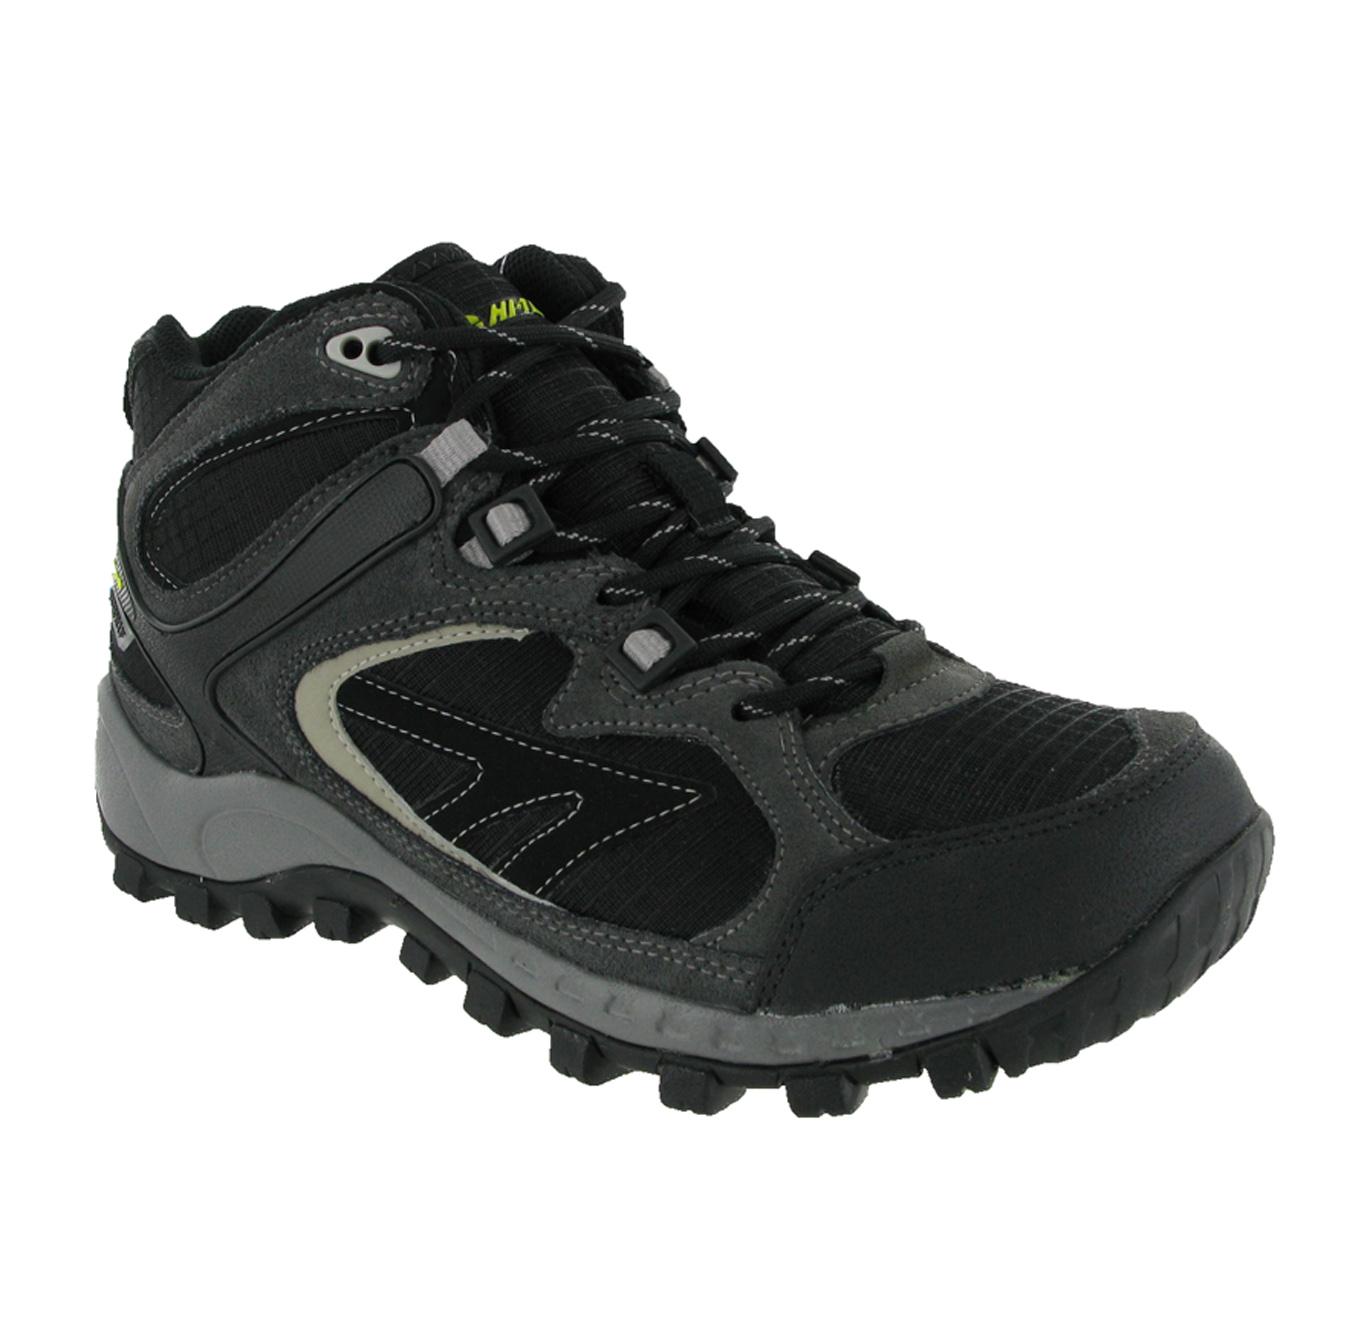 mens hi tec south trail mid black grey waterproof hiking